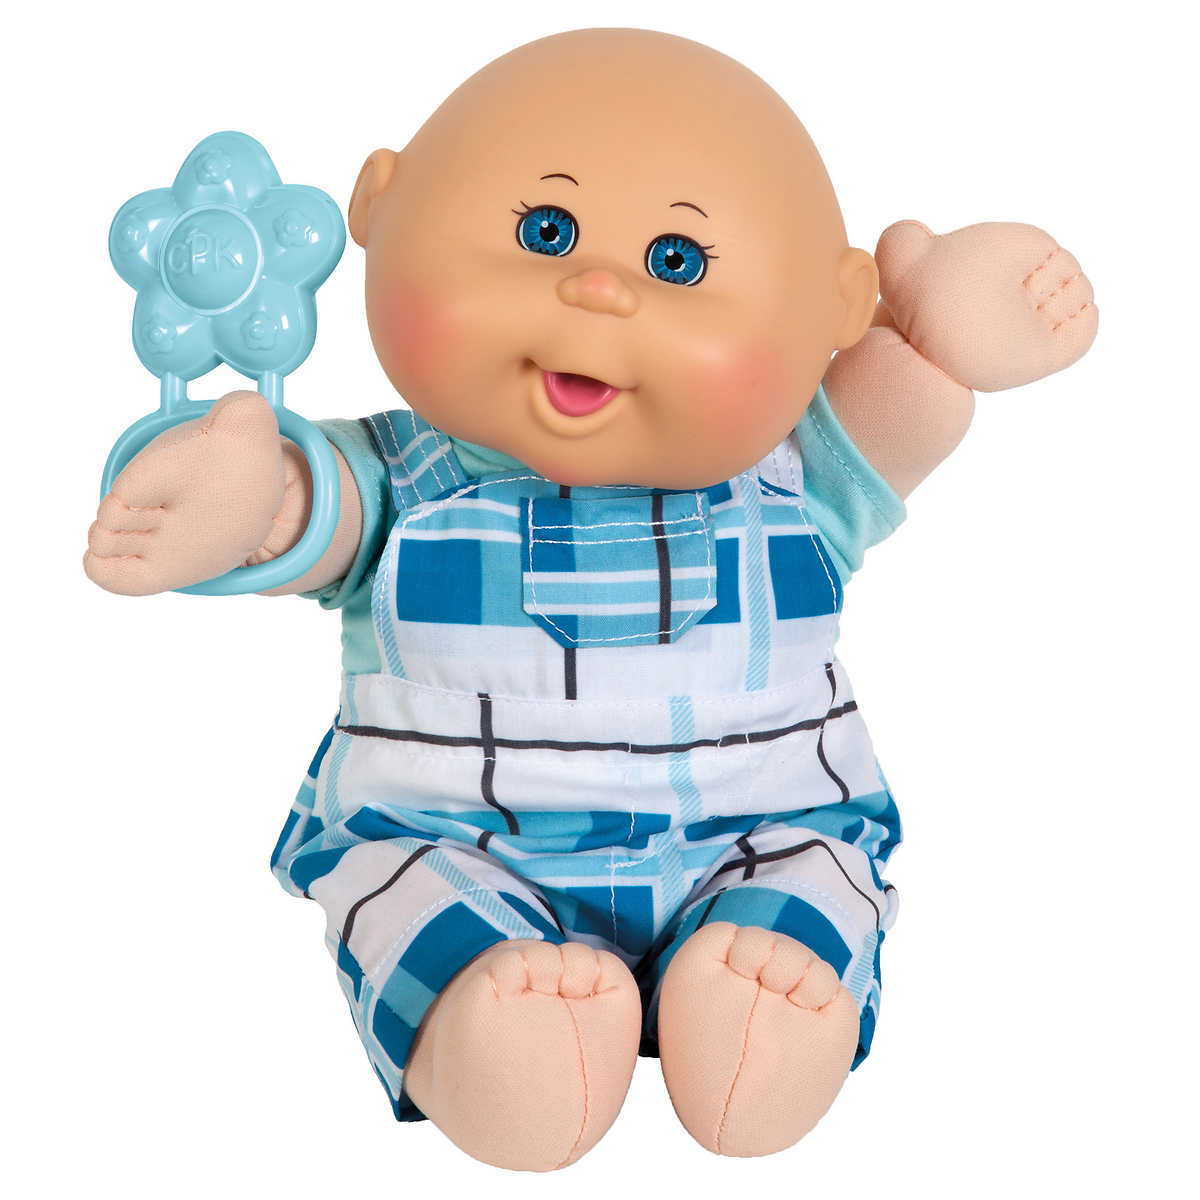 Cabbage Patch Naptime Baby Boy12 5 Blue Eyes Light Skin